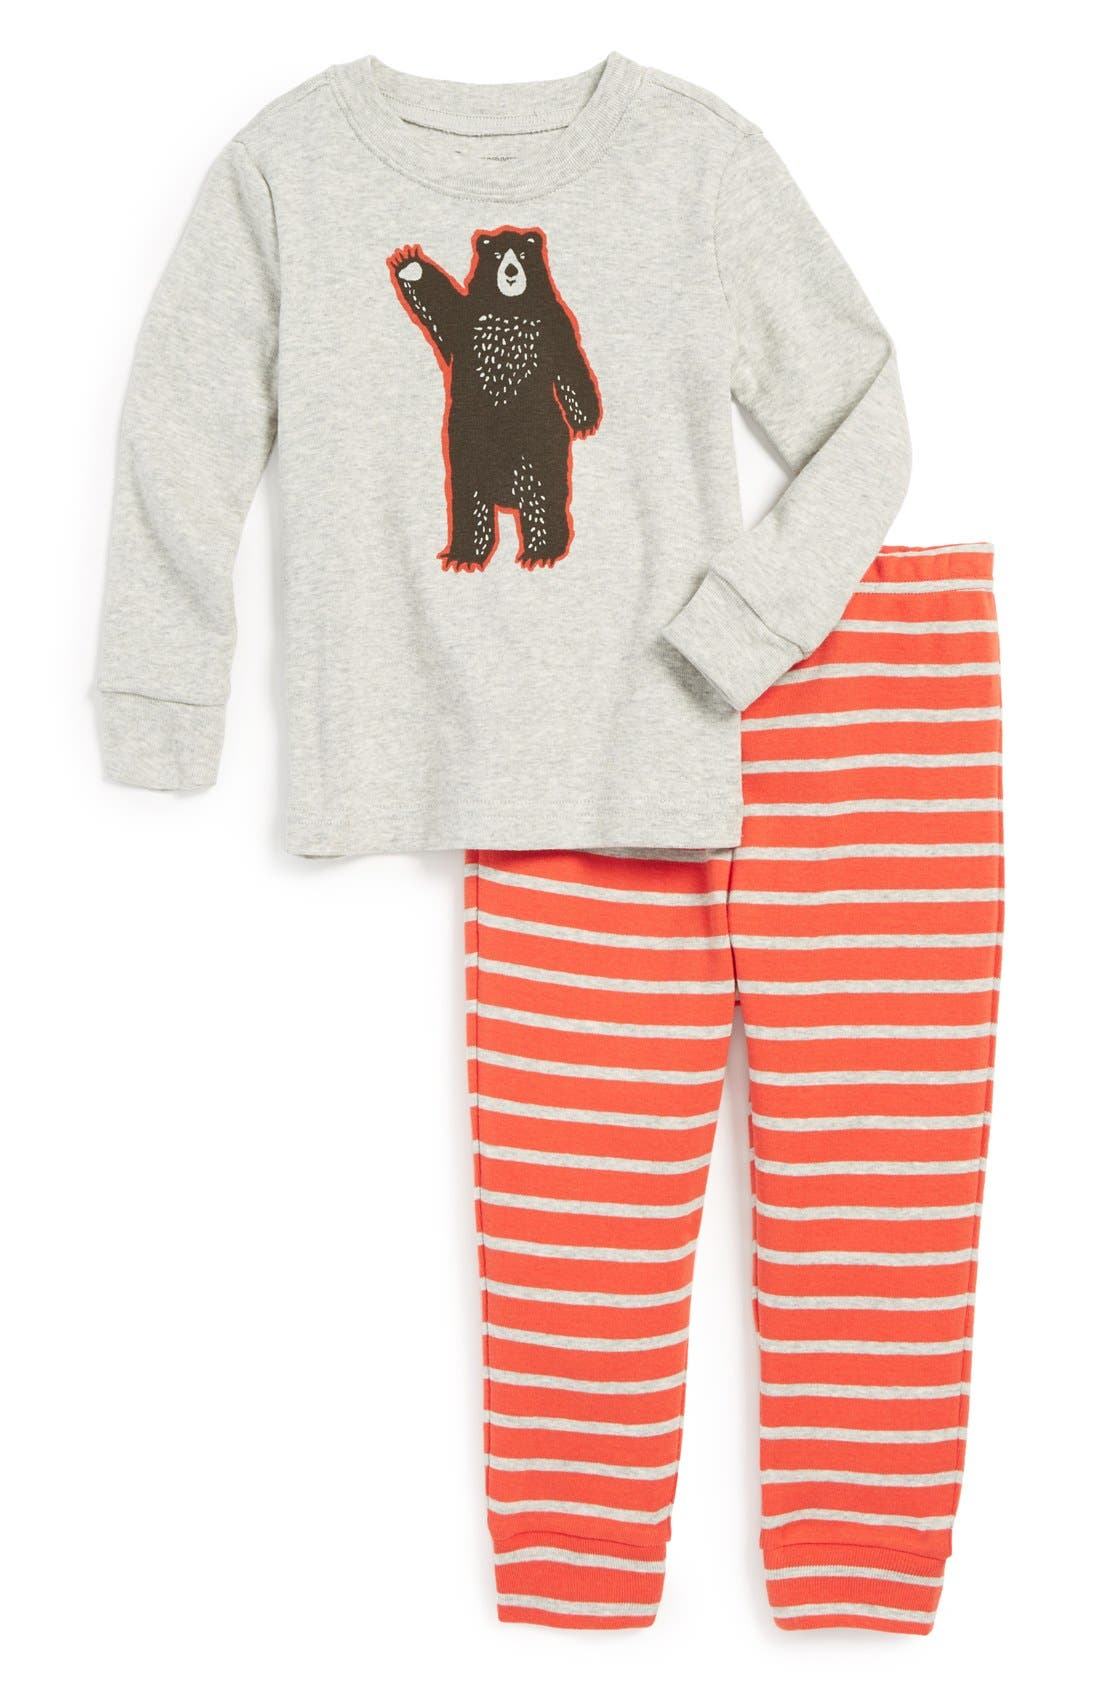 Main Image - Tucker + Tate Two-Piece Fitted Pajamas (Baby Boys)